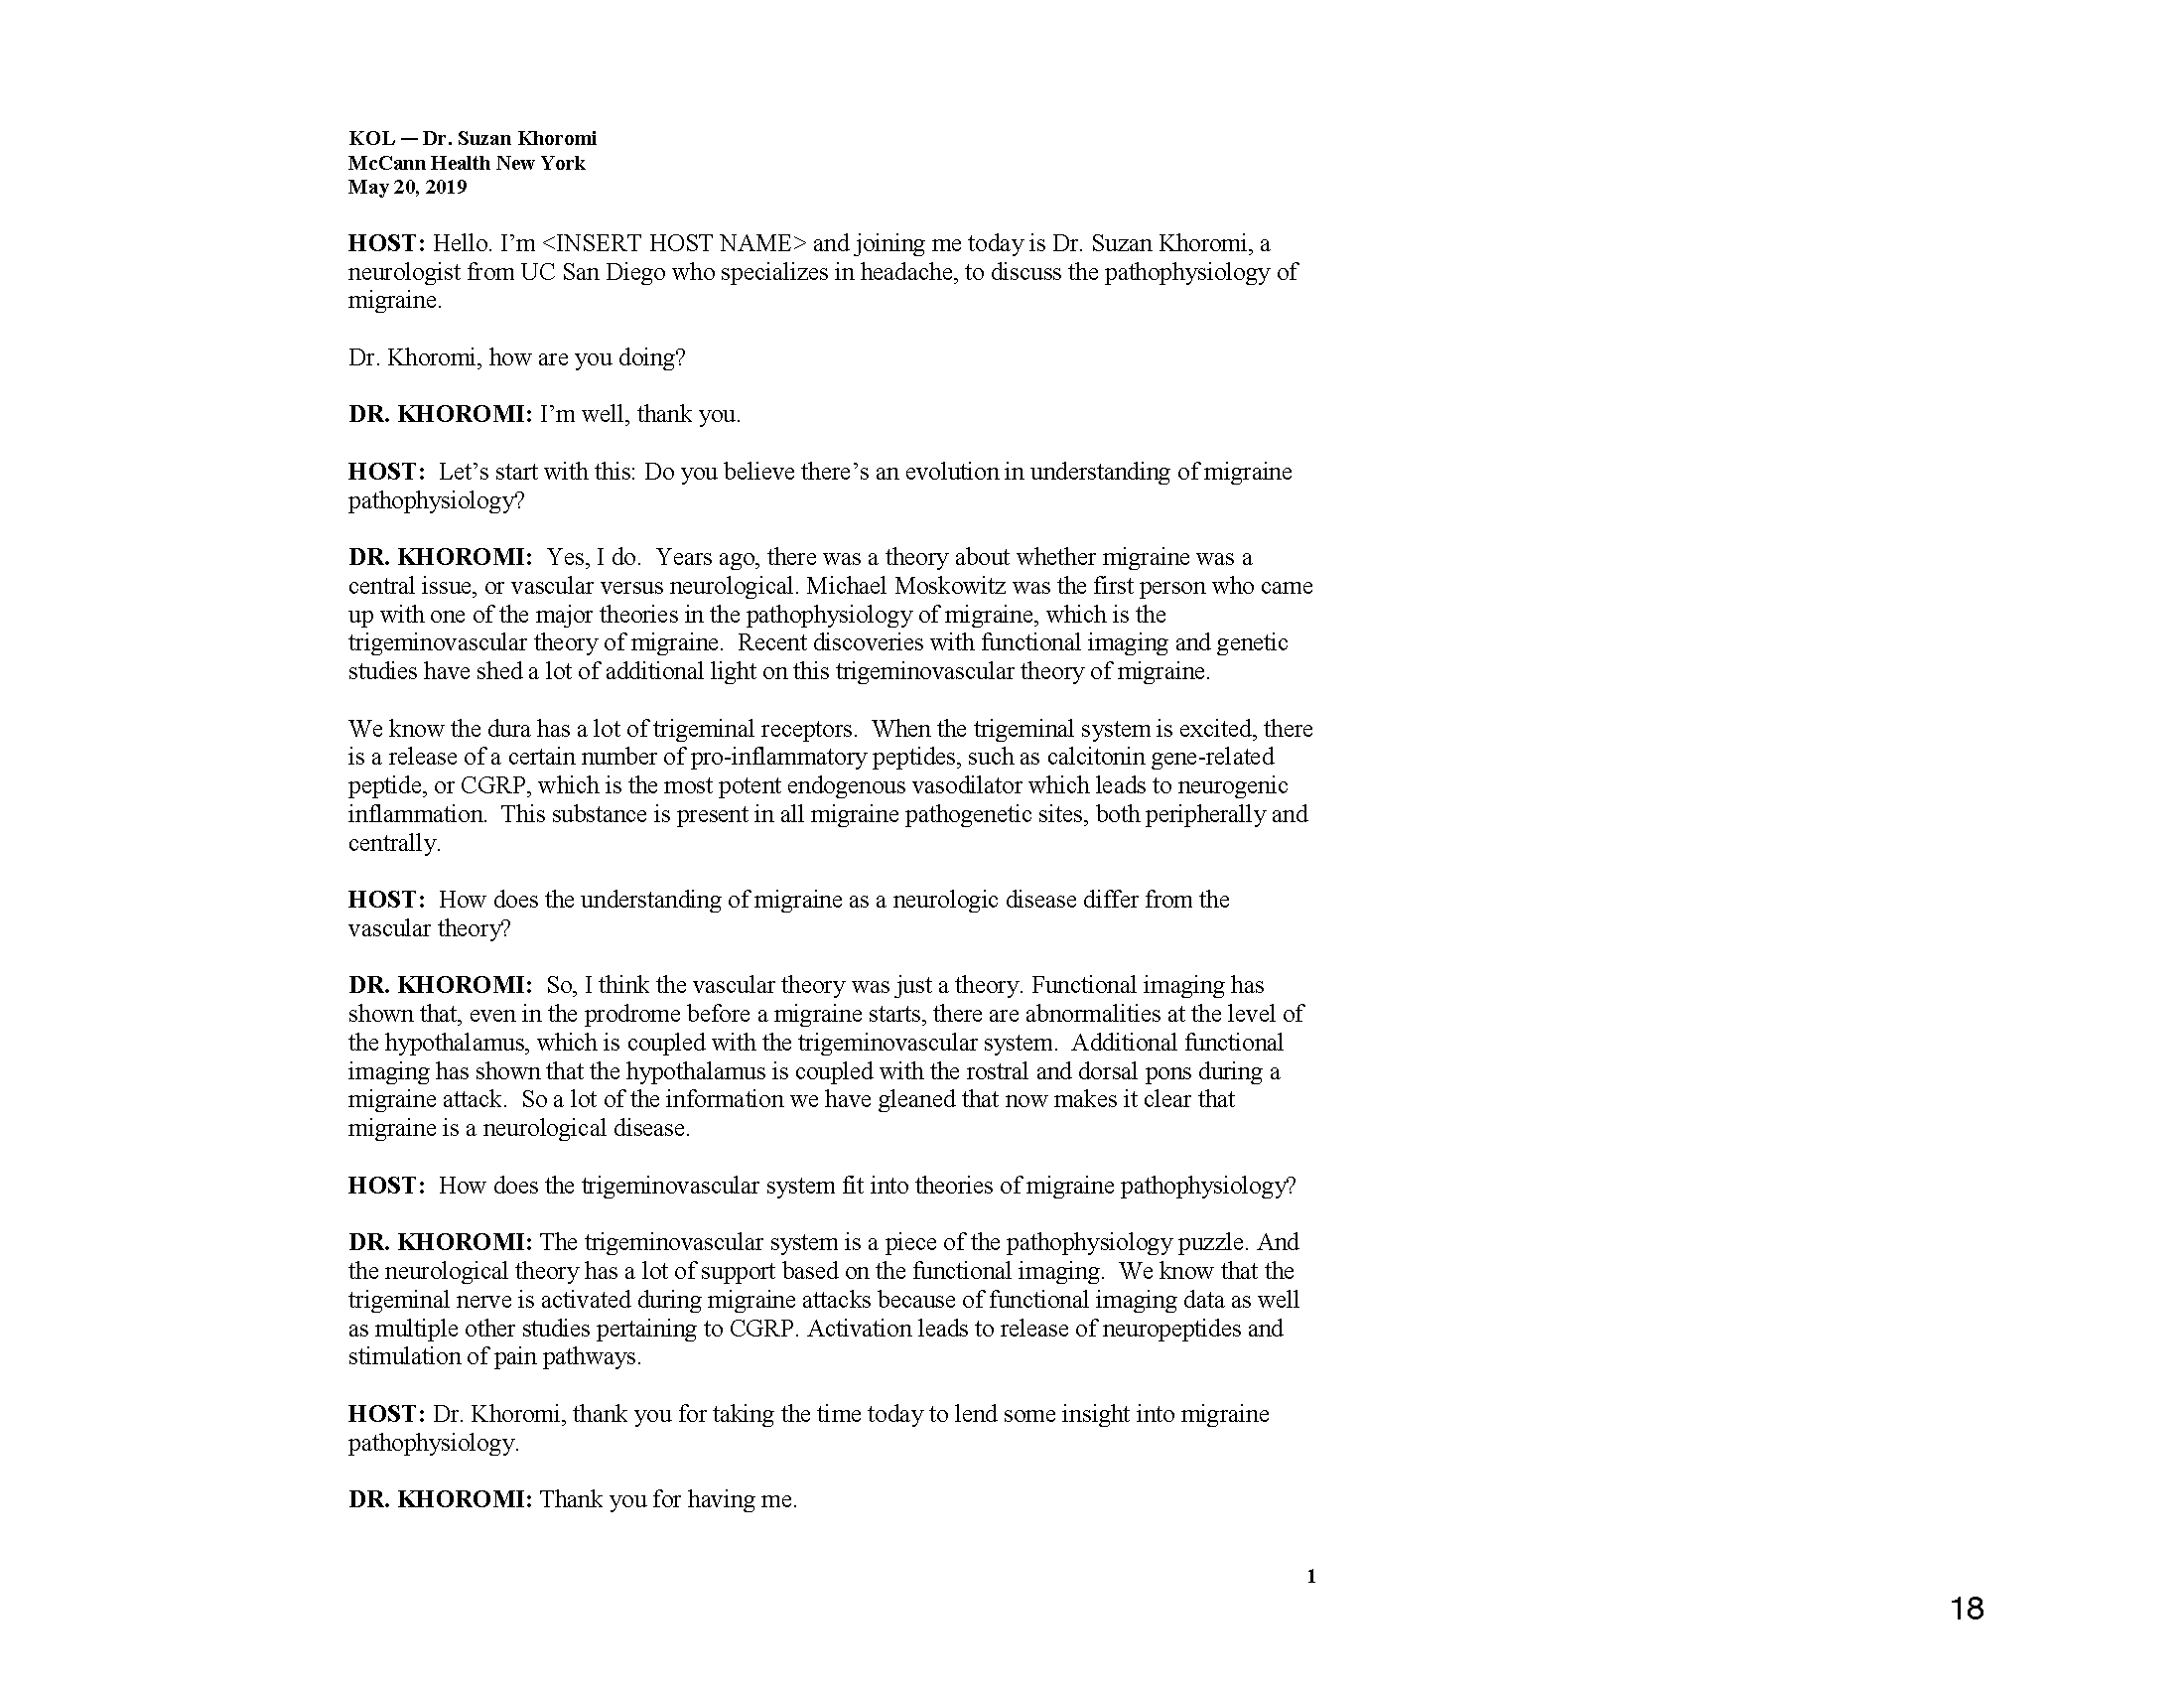 PPB_DSE_KOL_v6_Page_18.png